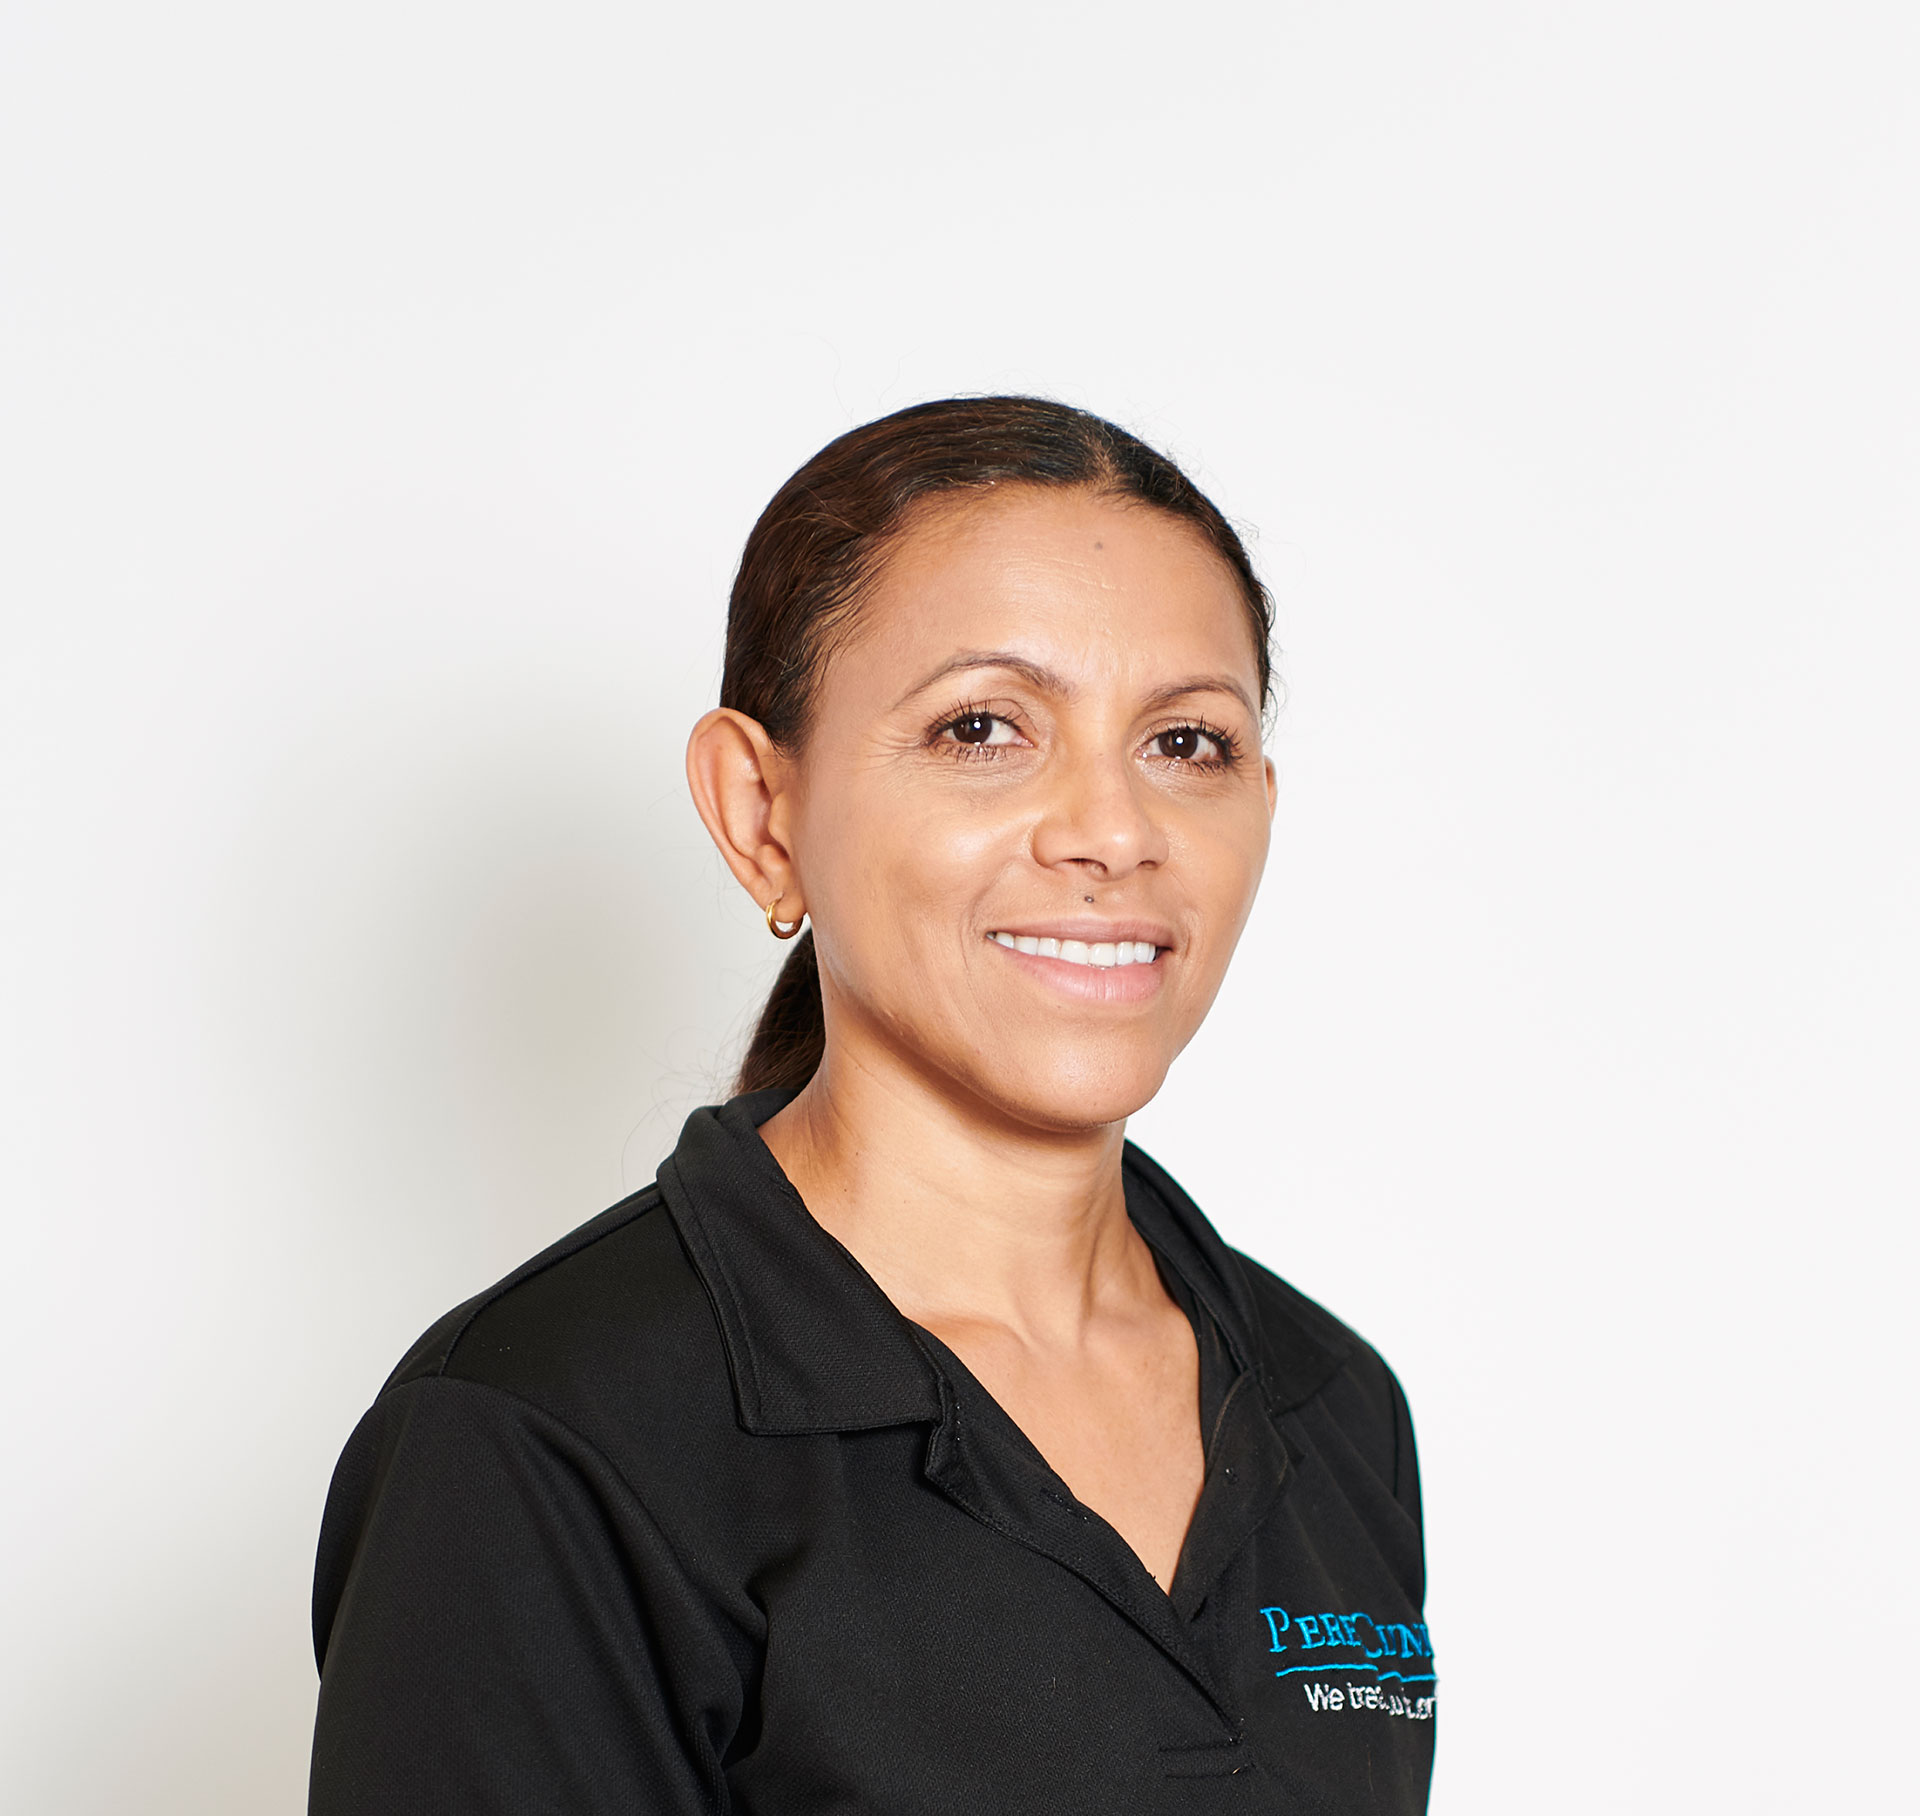 yaneth perea massage therapist